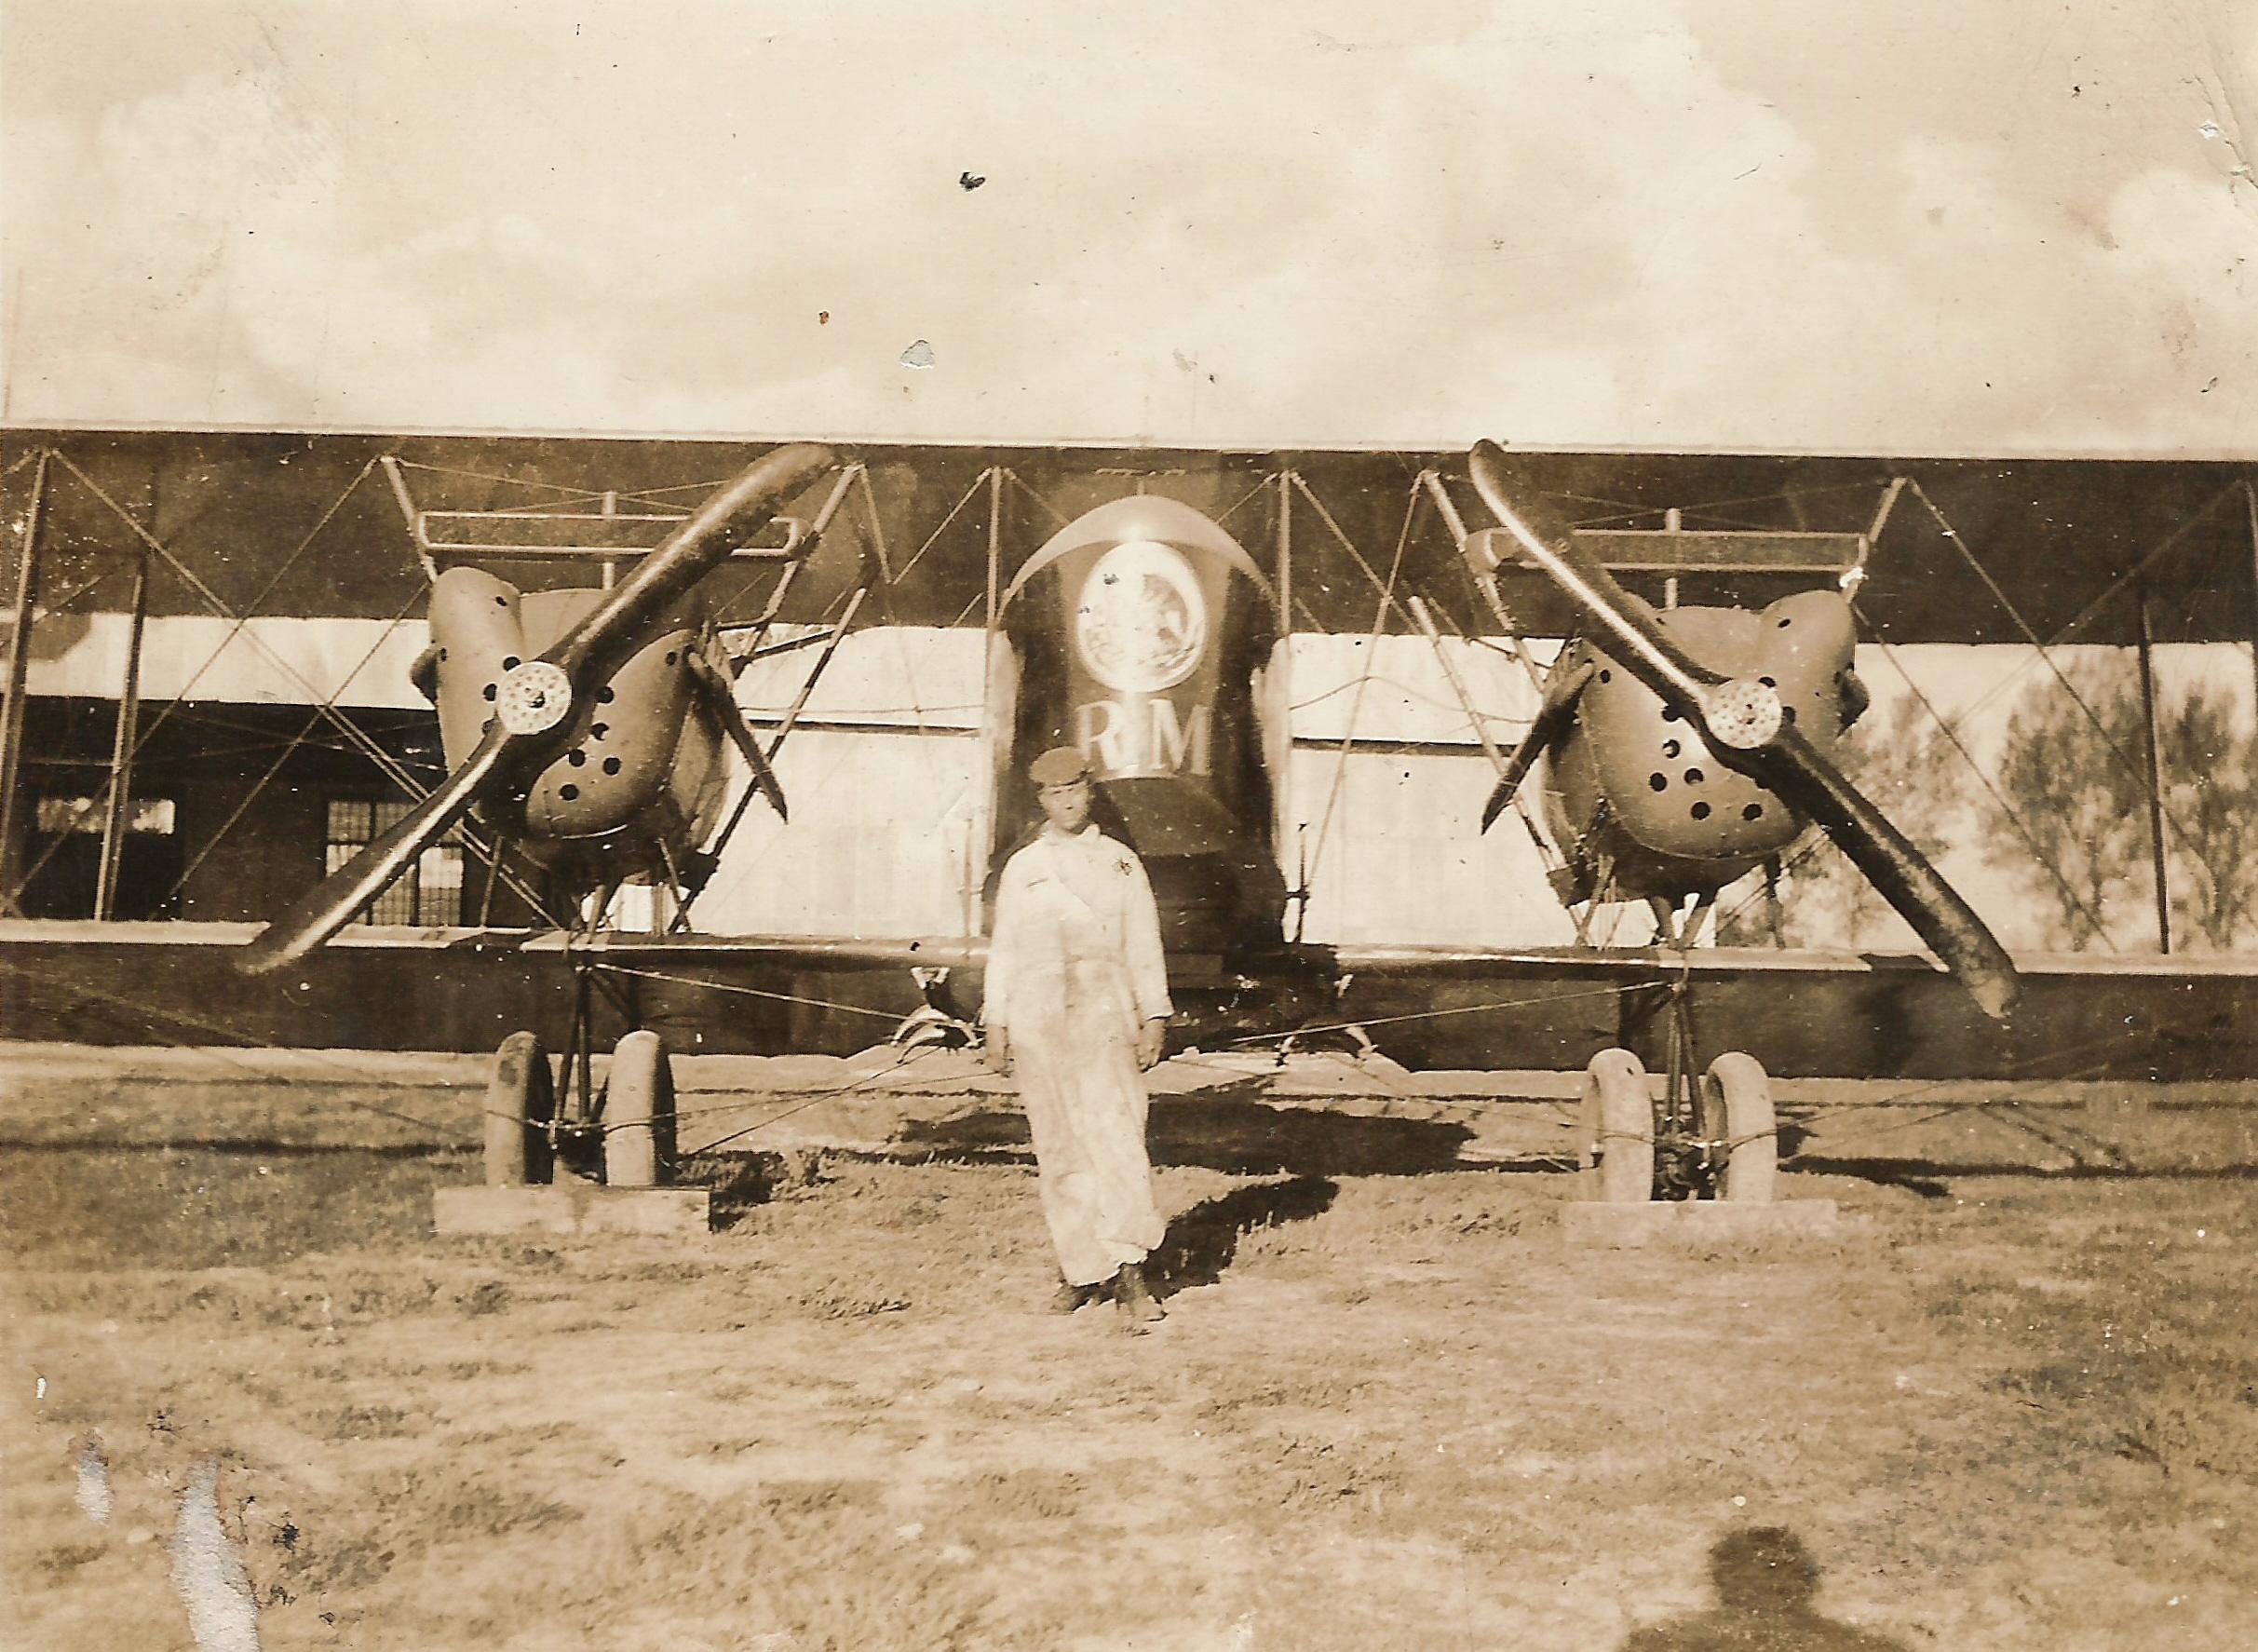 3. Aeroplano modelo Farman, al frente su profesor de mecánic